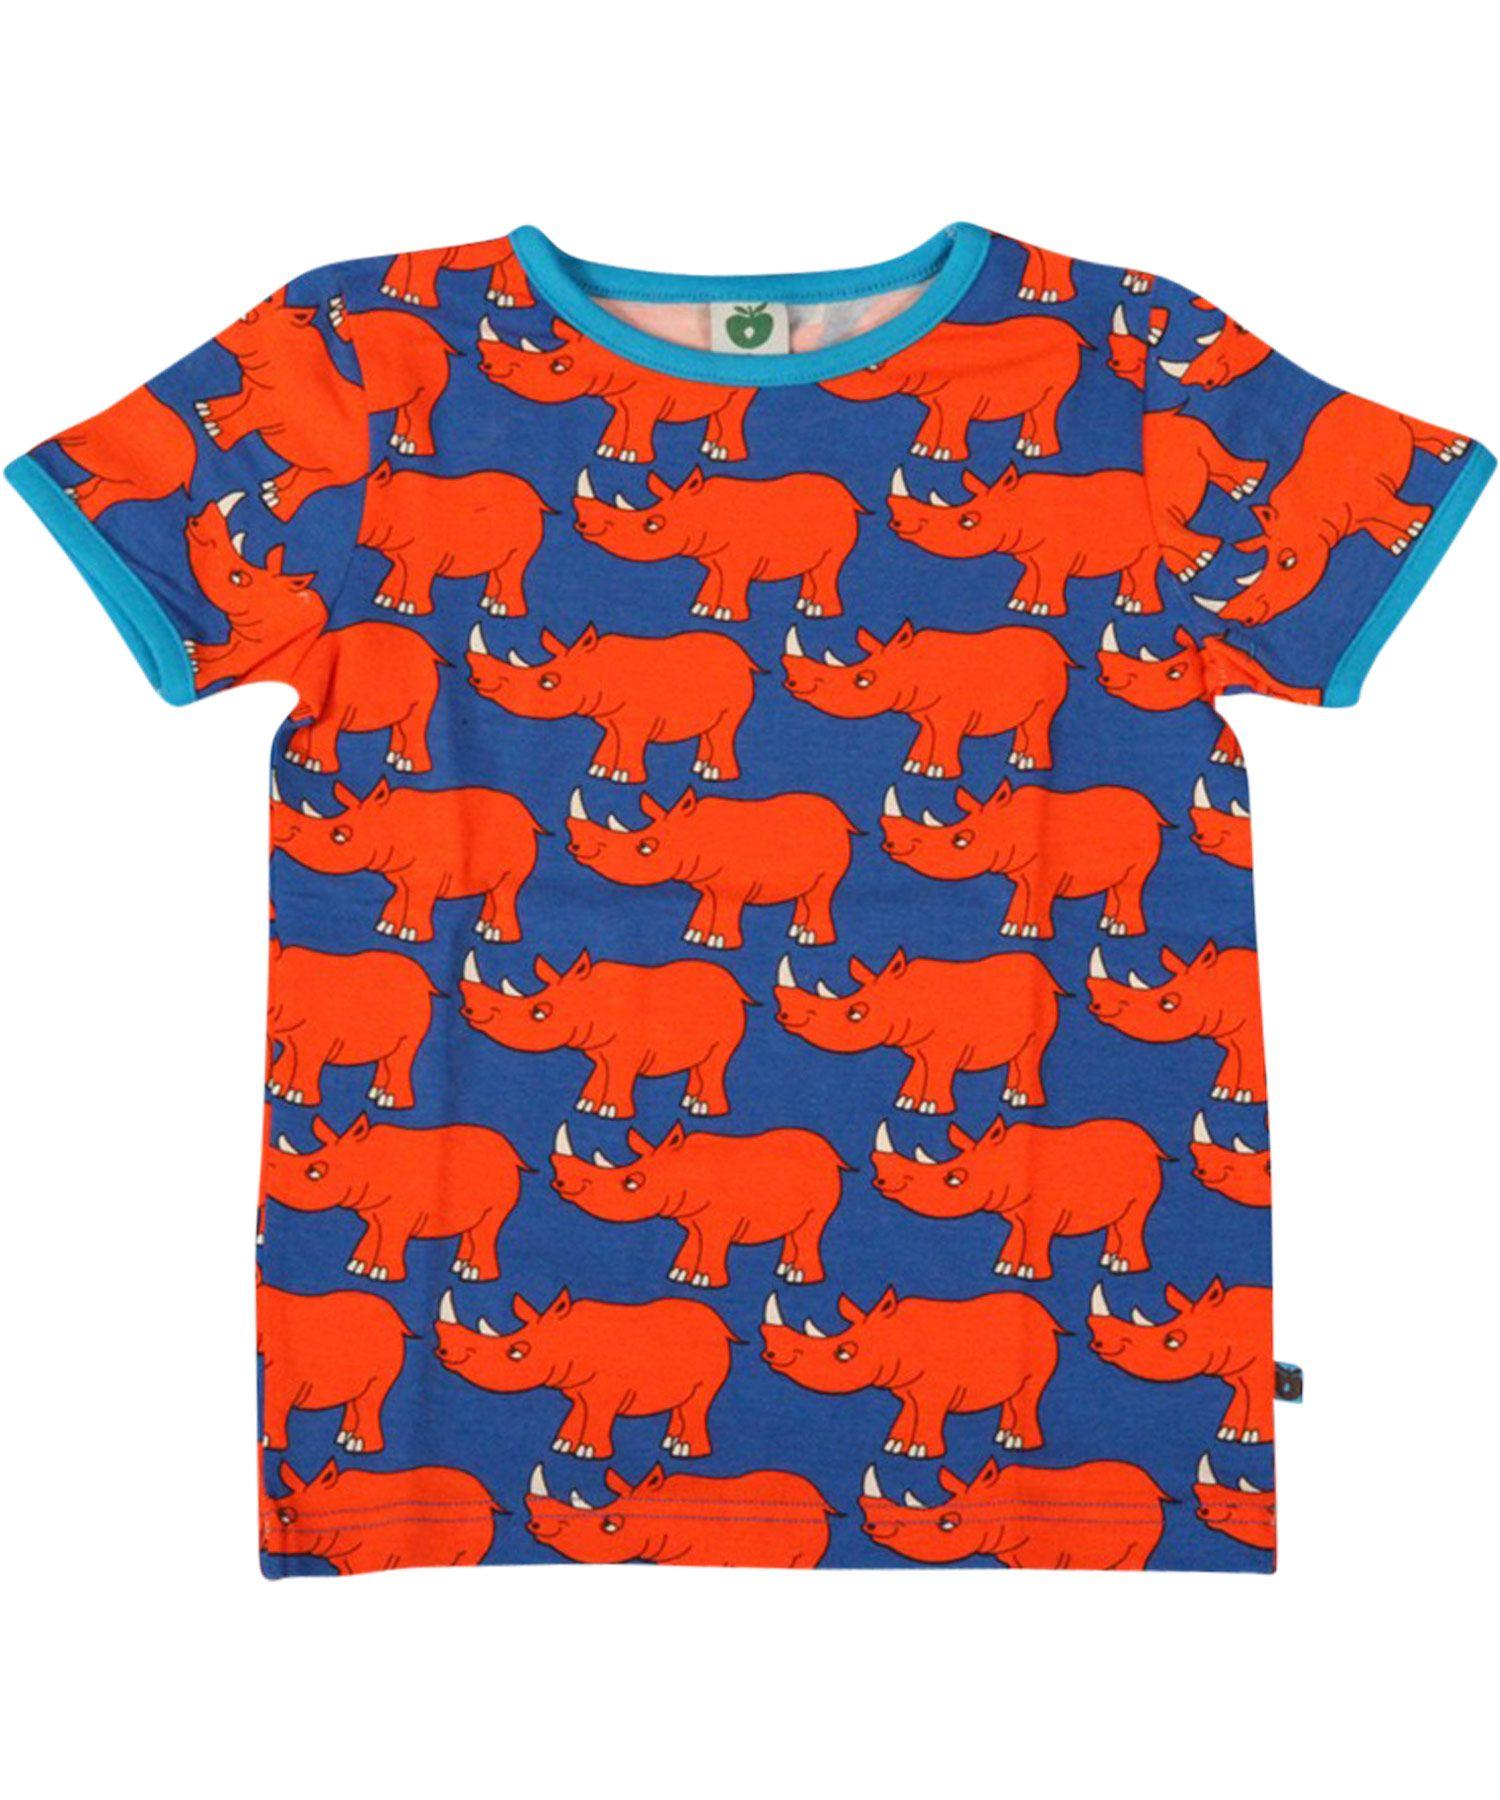 d893f2a4c69980 Småfolk sterke zomer t-shirt met neushoorns. smafolk.nl.emilea.be